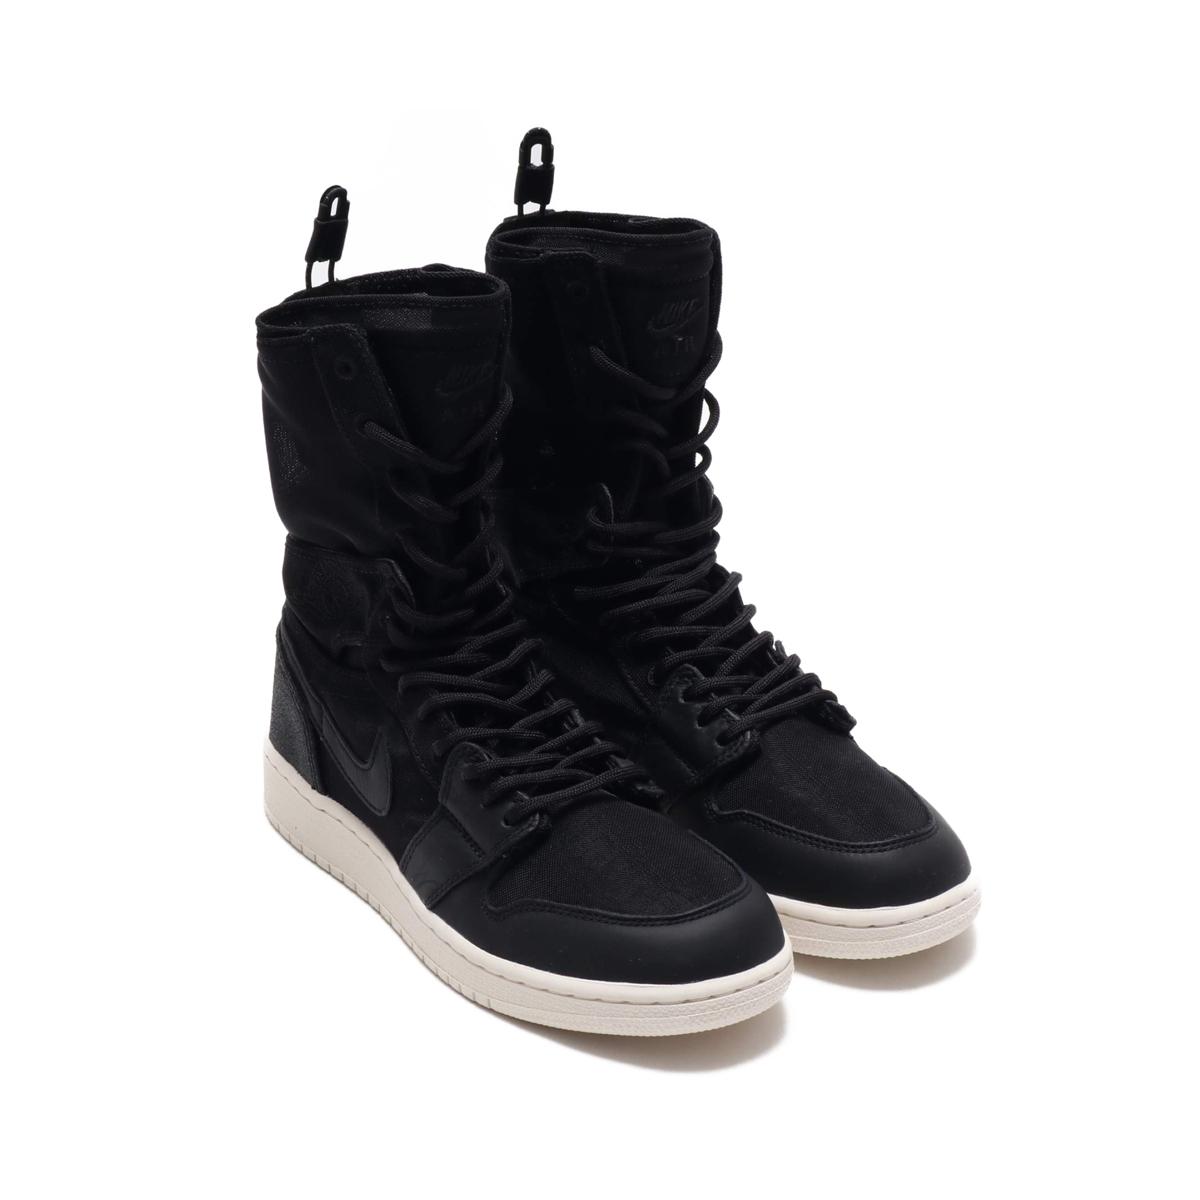 bcced368aa4 NIKE WMNS AIR JORDAN 1 EXPLORER XX (Nike women Air Jordan 1 Explorer XX)  BLACK/PHANTOM 18FA-S